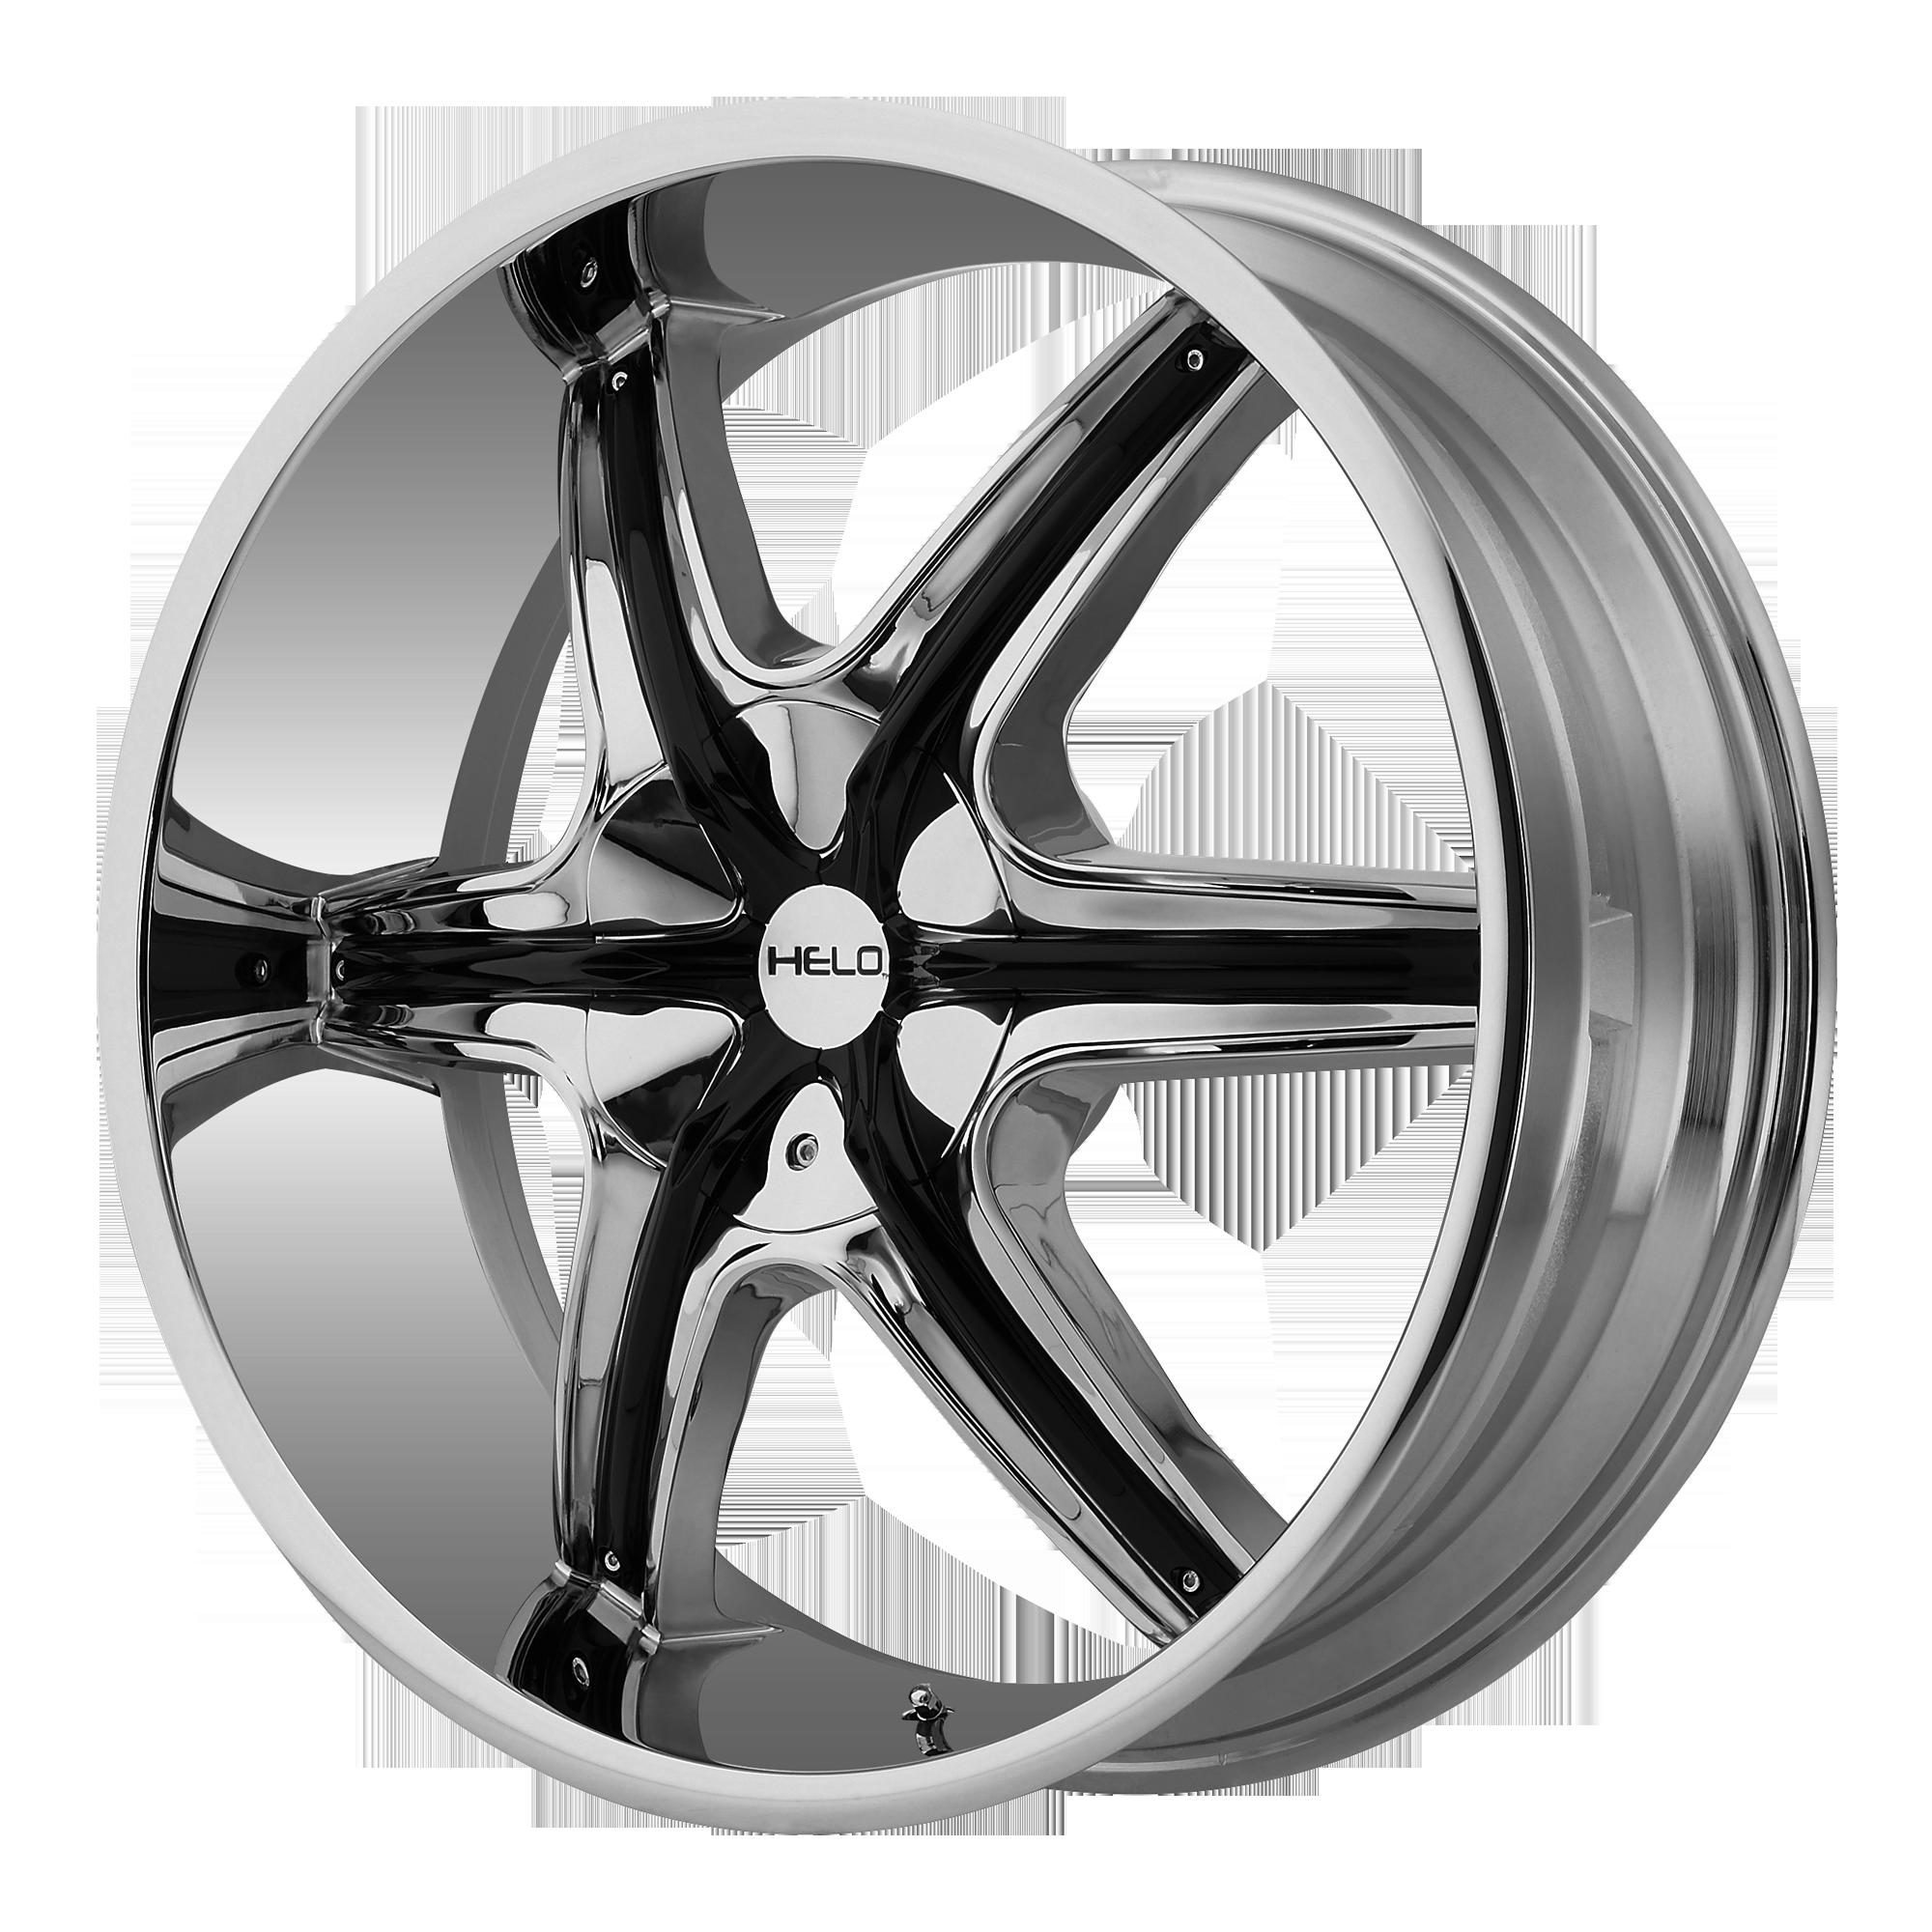 Helo Wheels HE891 Chrome w/ Gloss Black and Chrome Accents